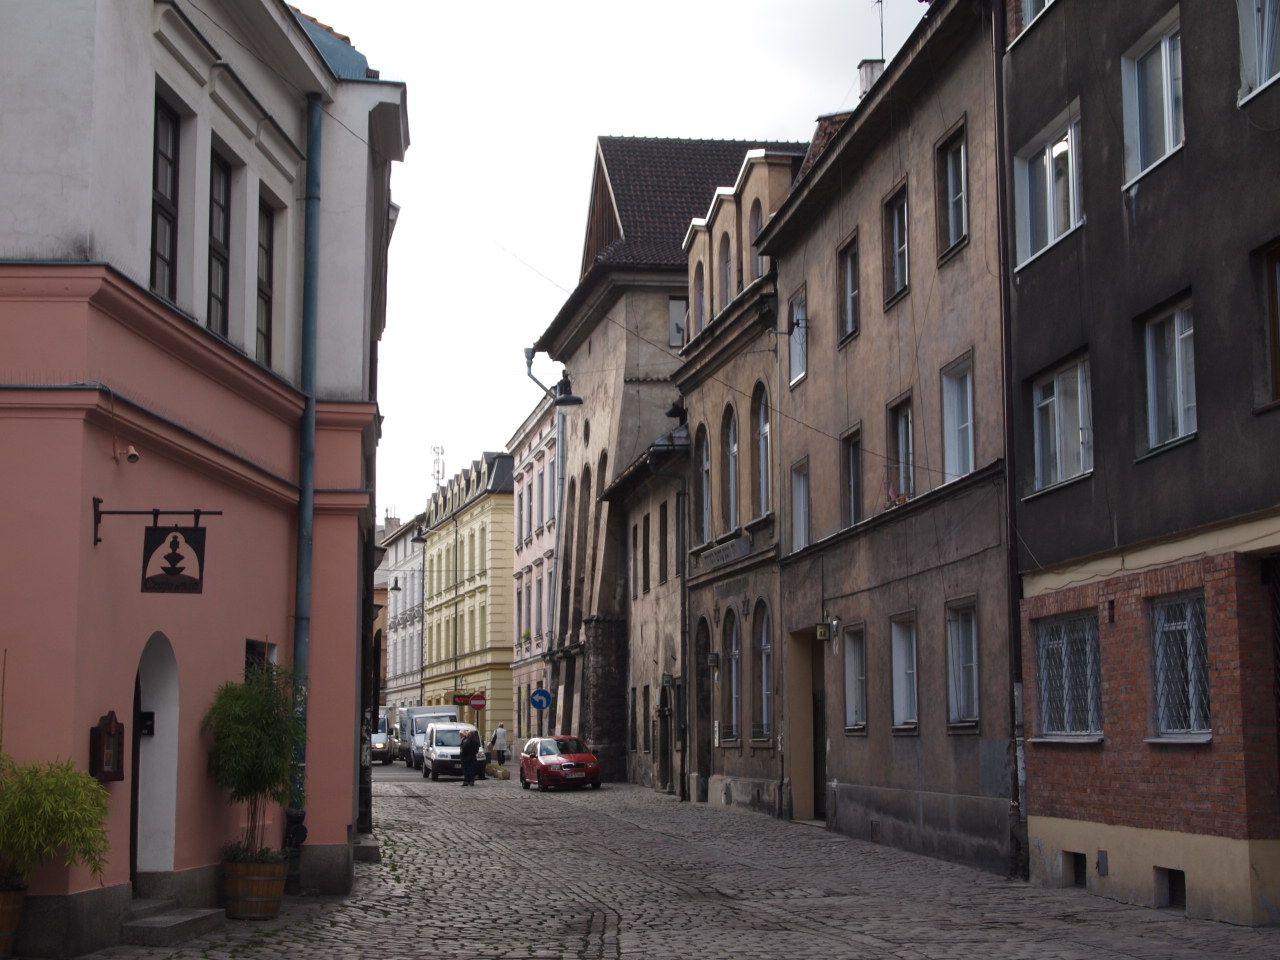 Bohemian Kazimierz tour in Krakow